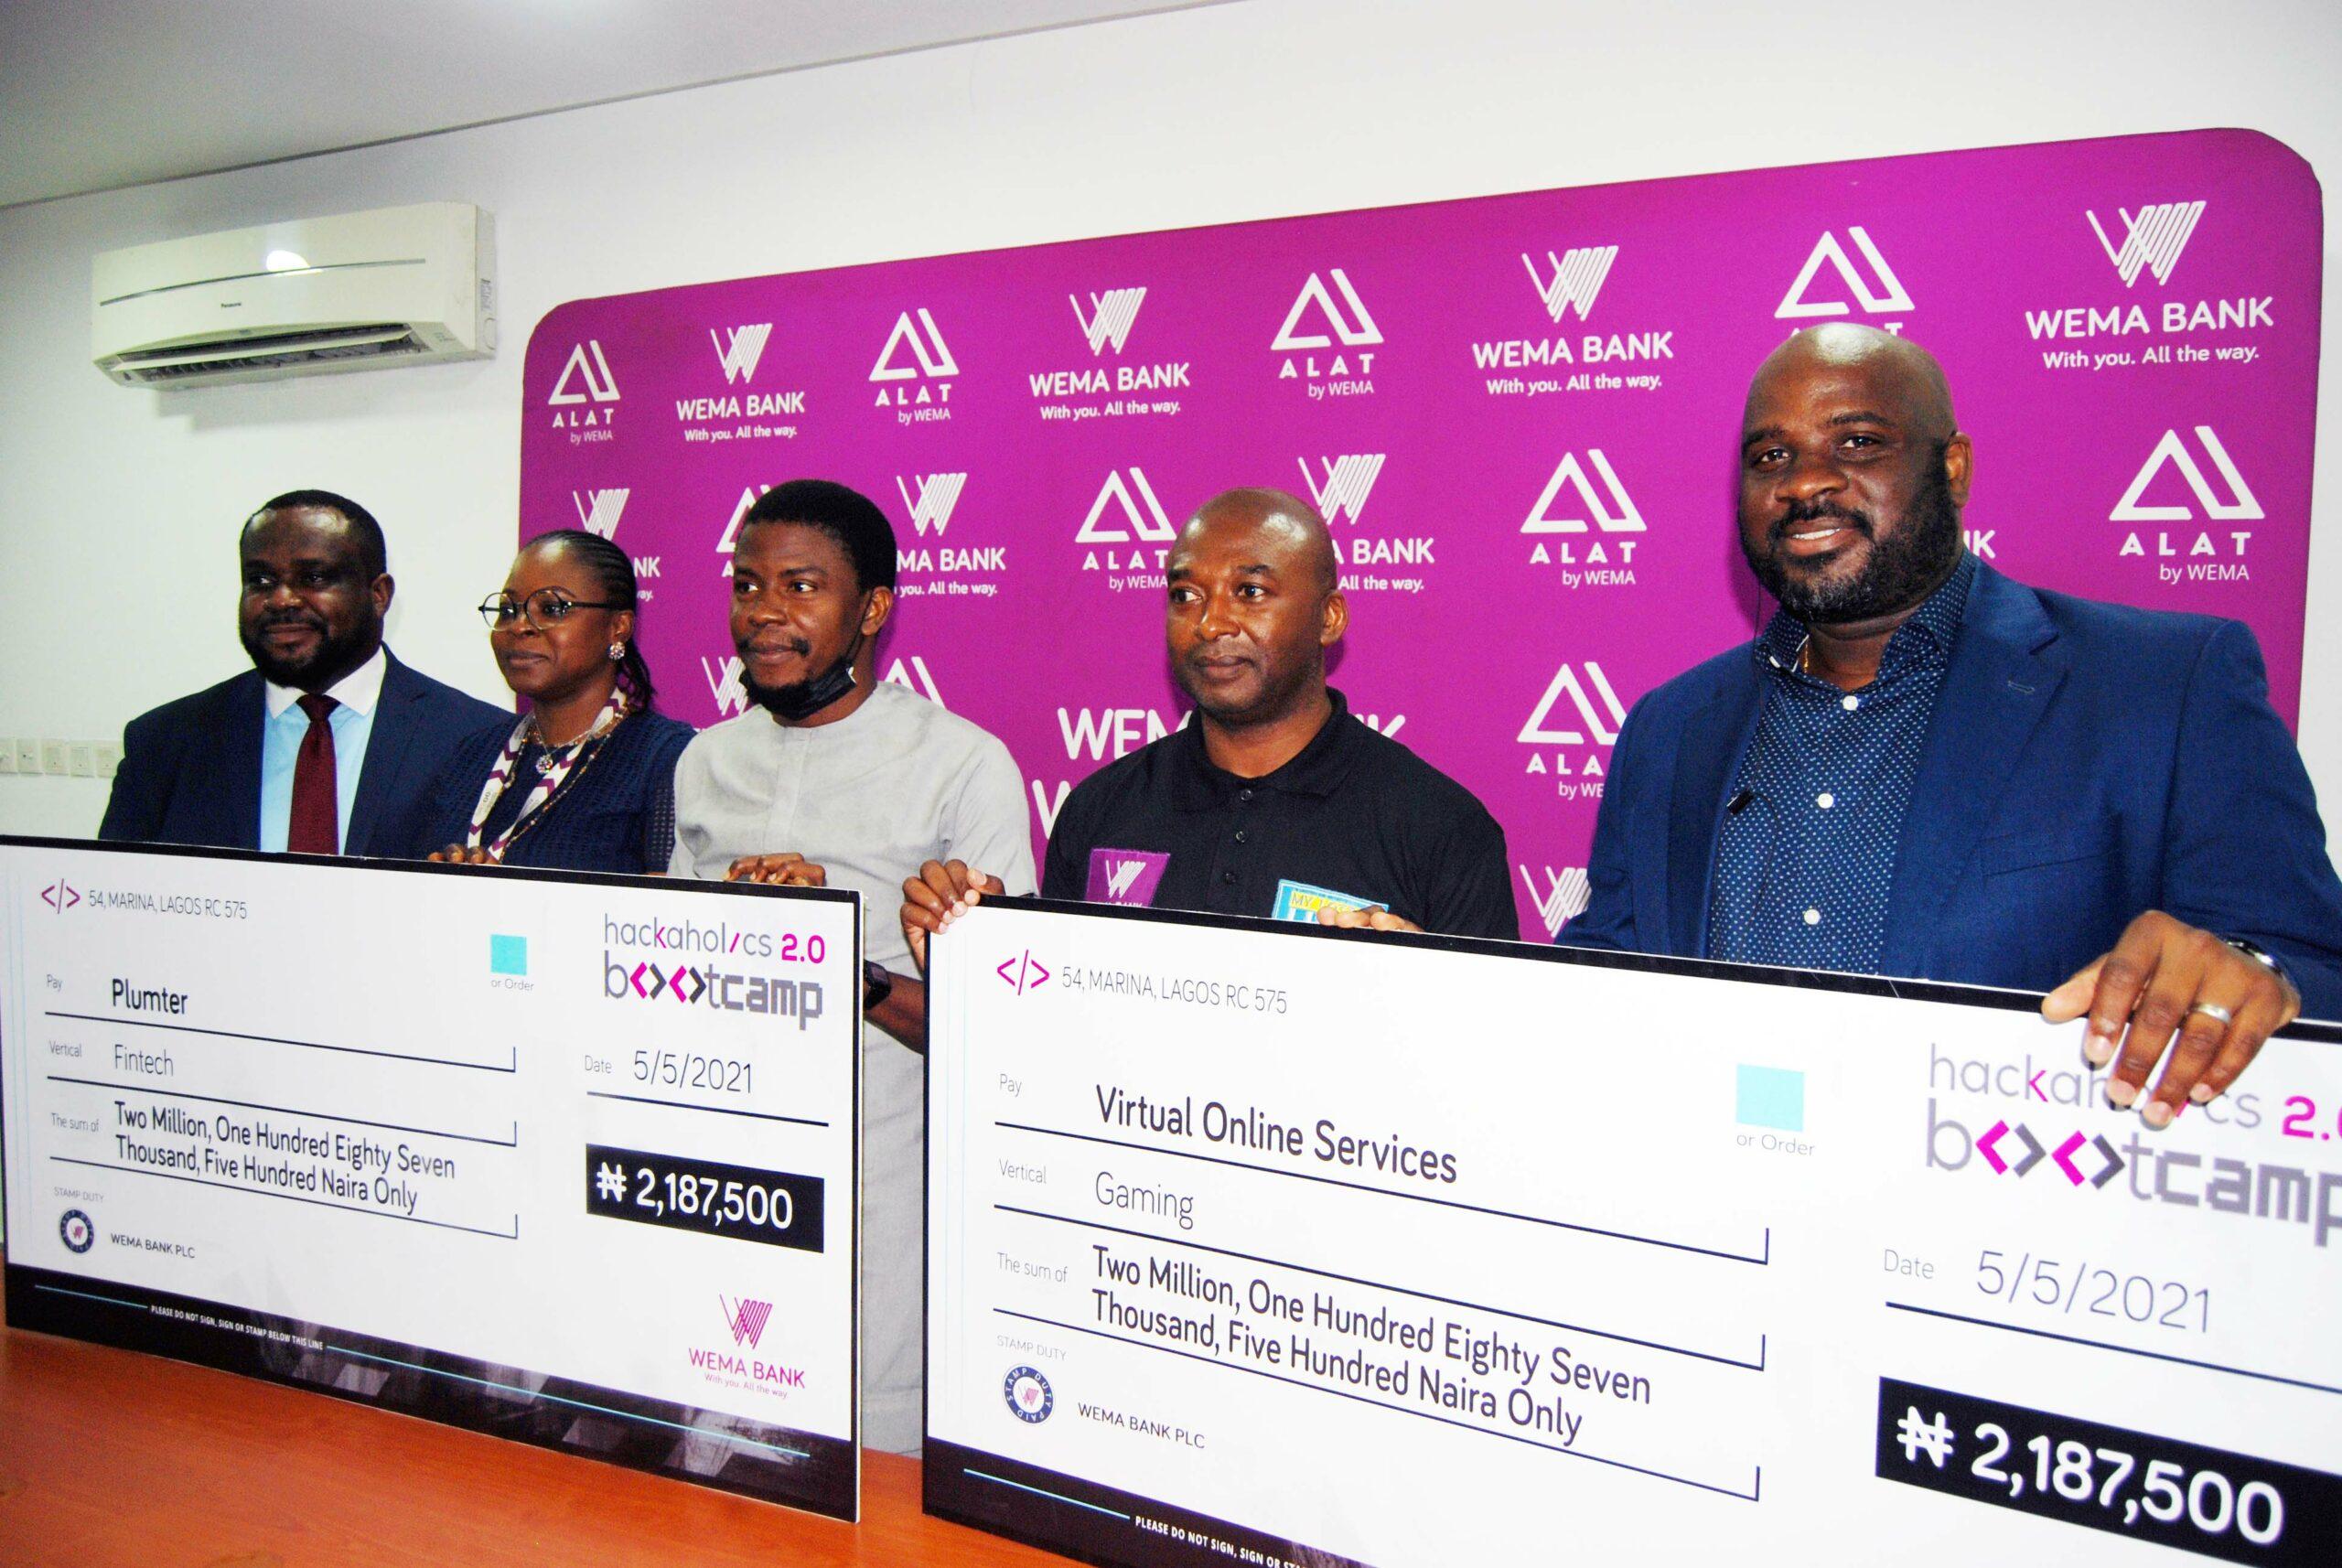 Wema Bank Brand News Day